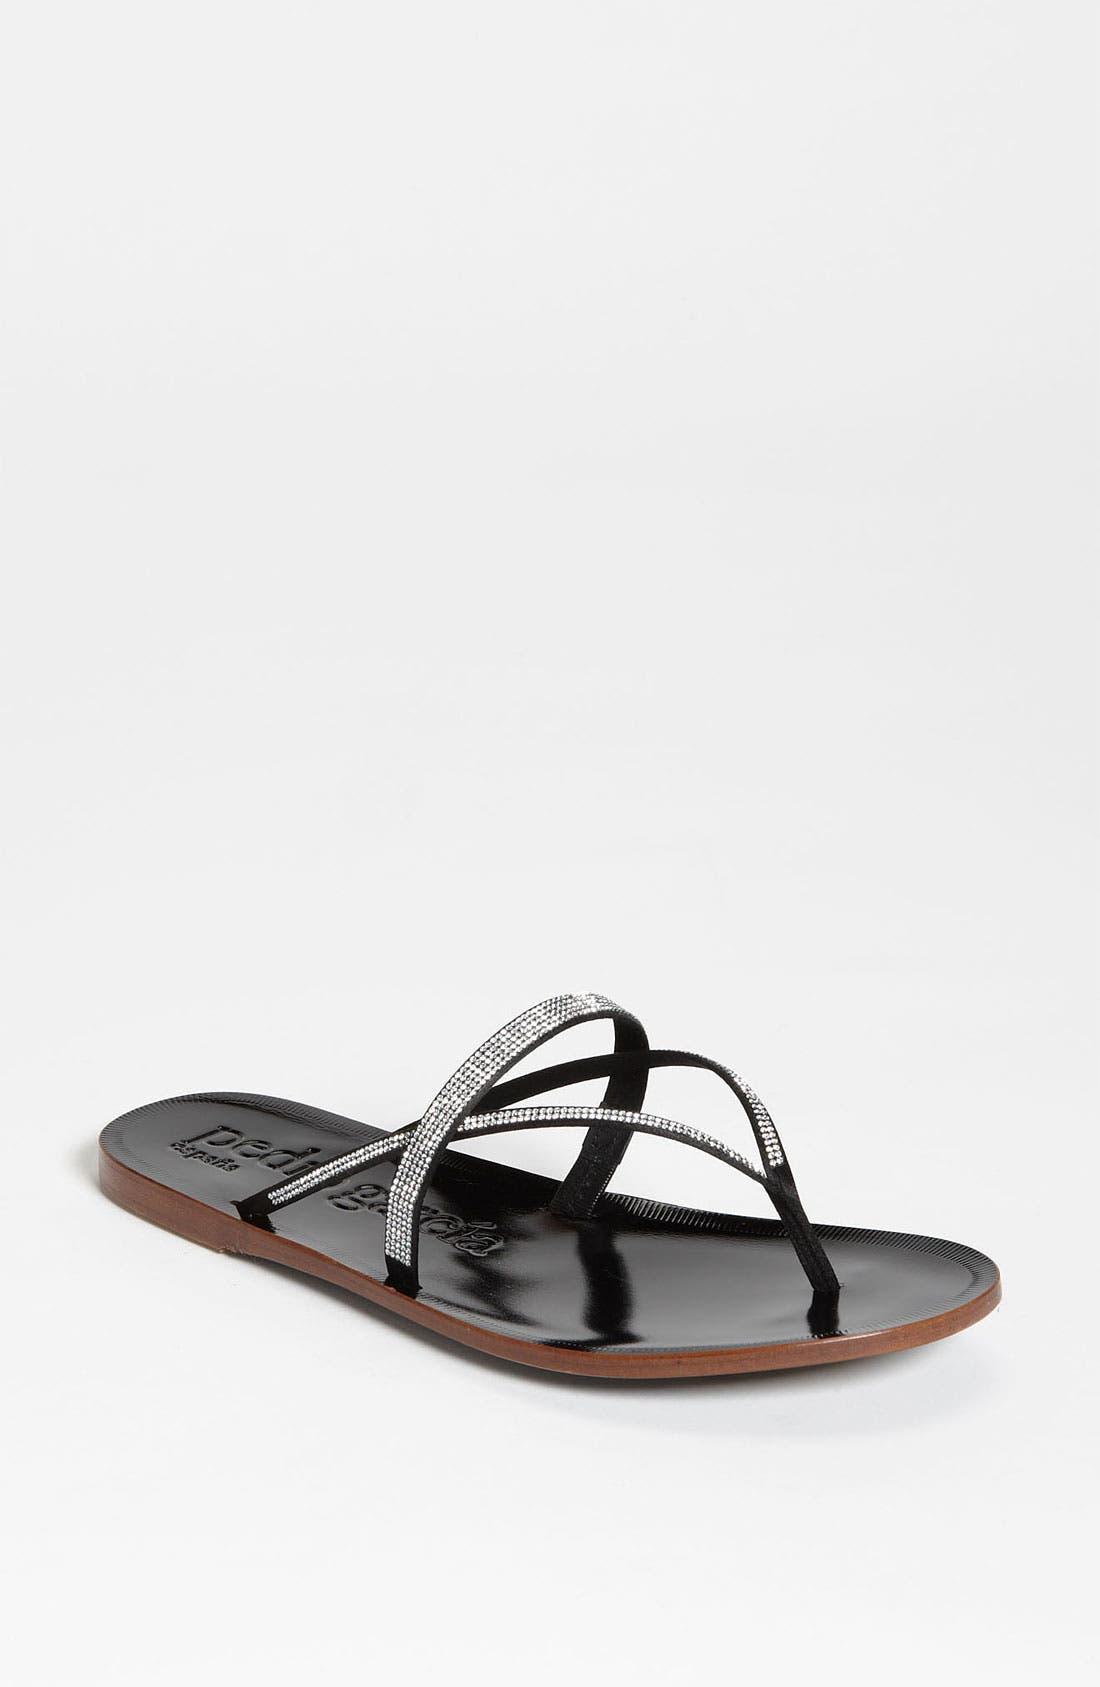 Alternate Image 1 Selected - Pedro Garcia 'Zuriel' Thong Sandal